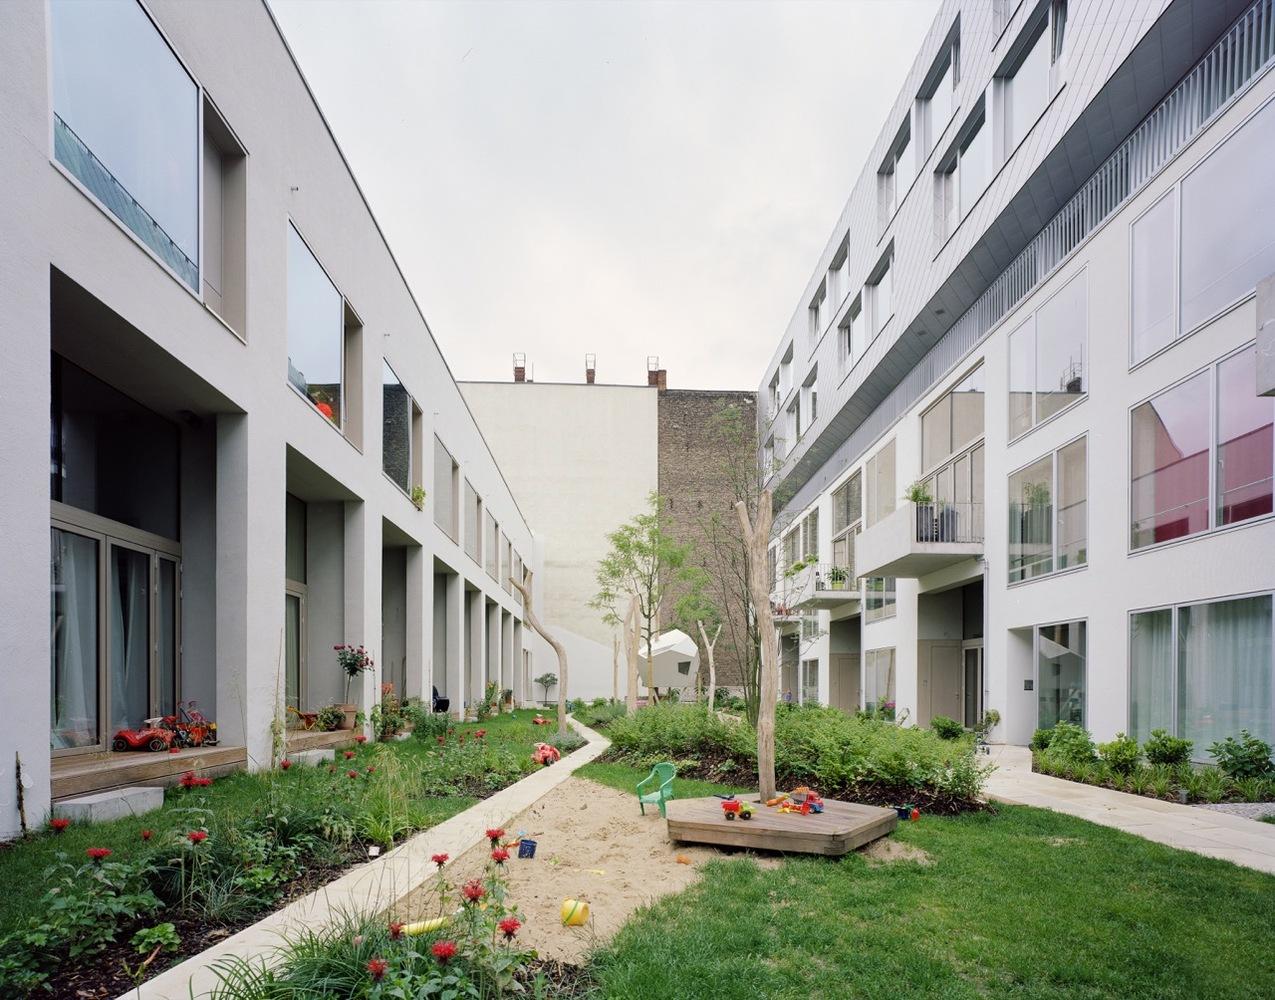 Big Yard, Berlin, by Zanderroth Architekten (image © Simon Menges via Archdaily)